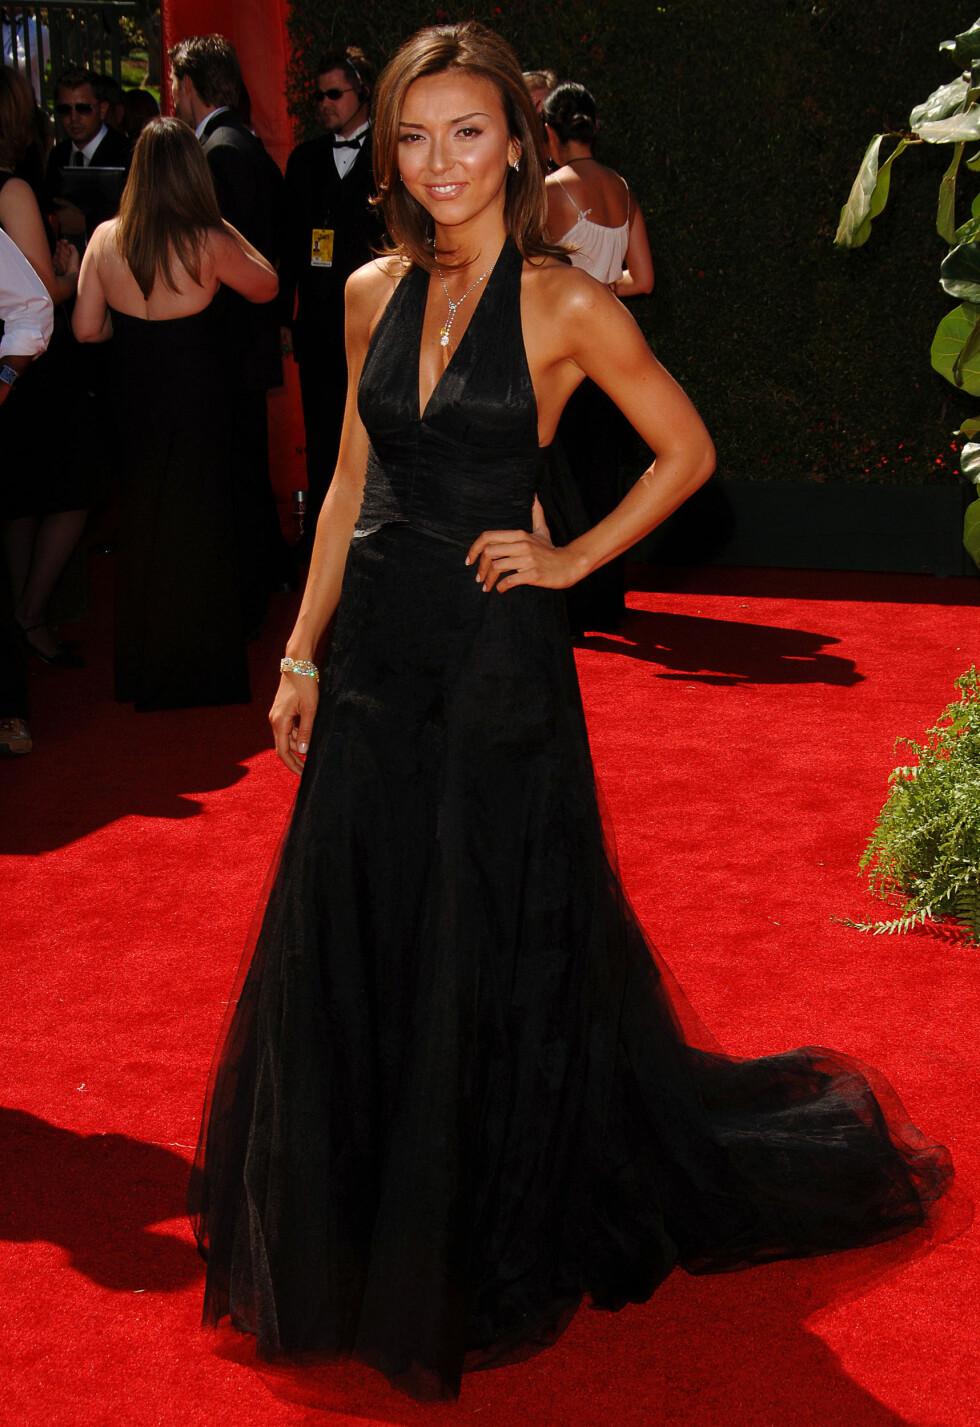 FRESH: Giuliana, dengang med fødenavnet DePandi, strålte på Emmy Awards i august 2006. Foto: © Fernando Allende/Splash News/ All Over Press